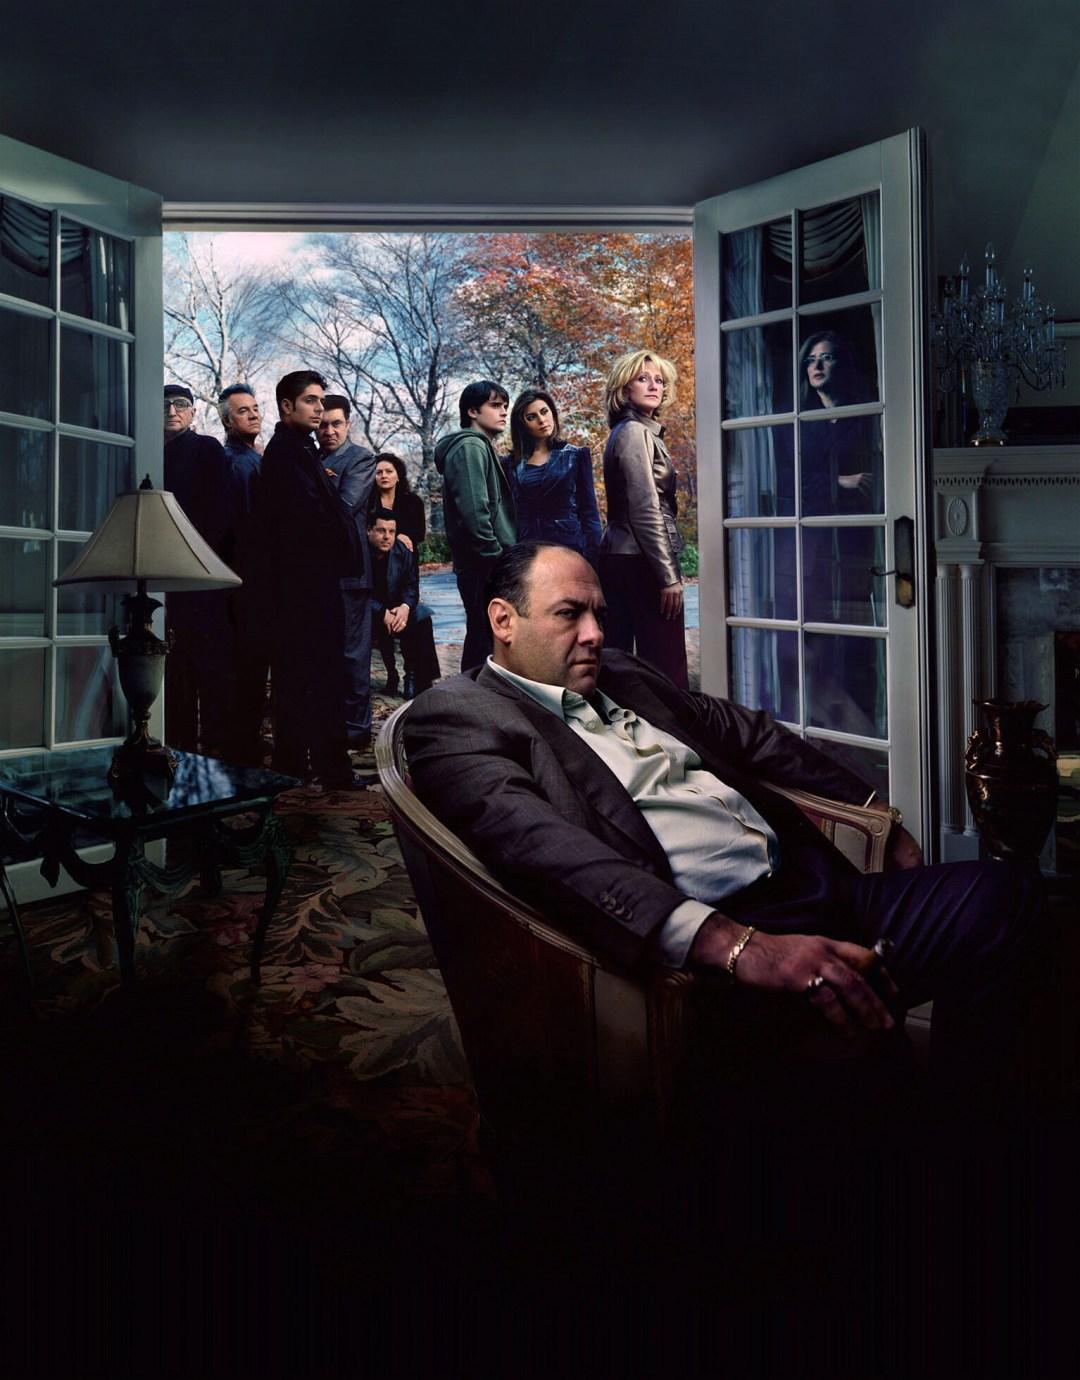 James Gandofini / The Sopranos